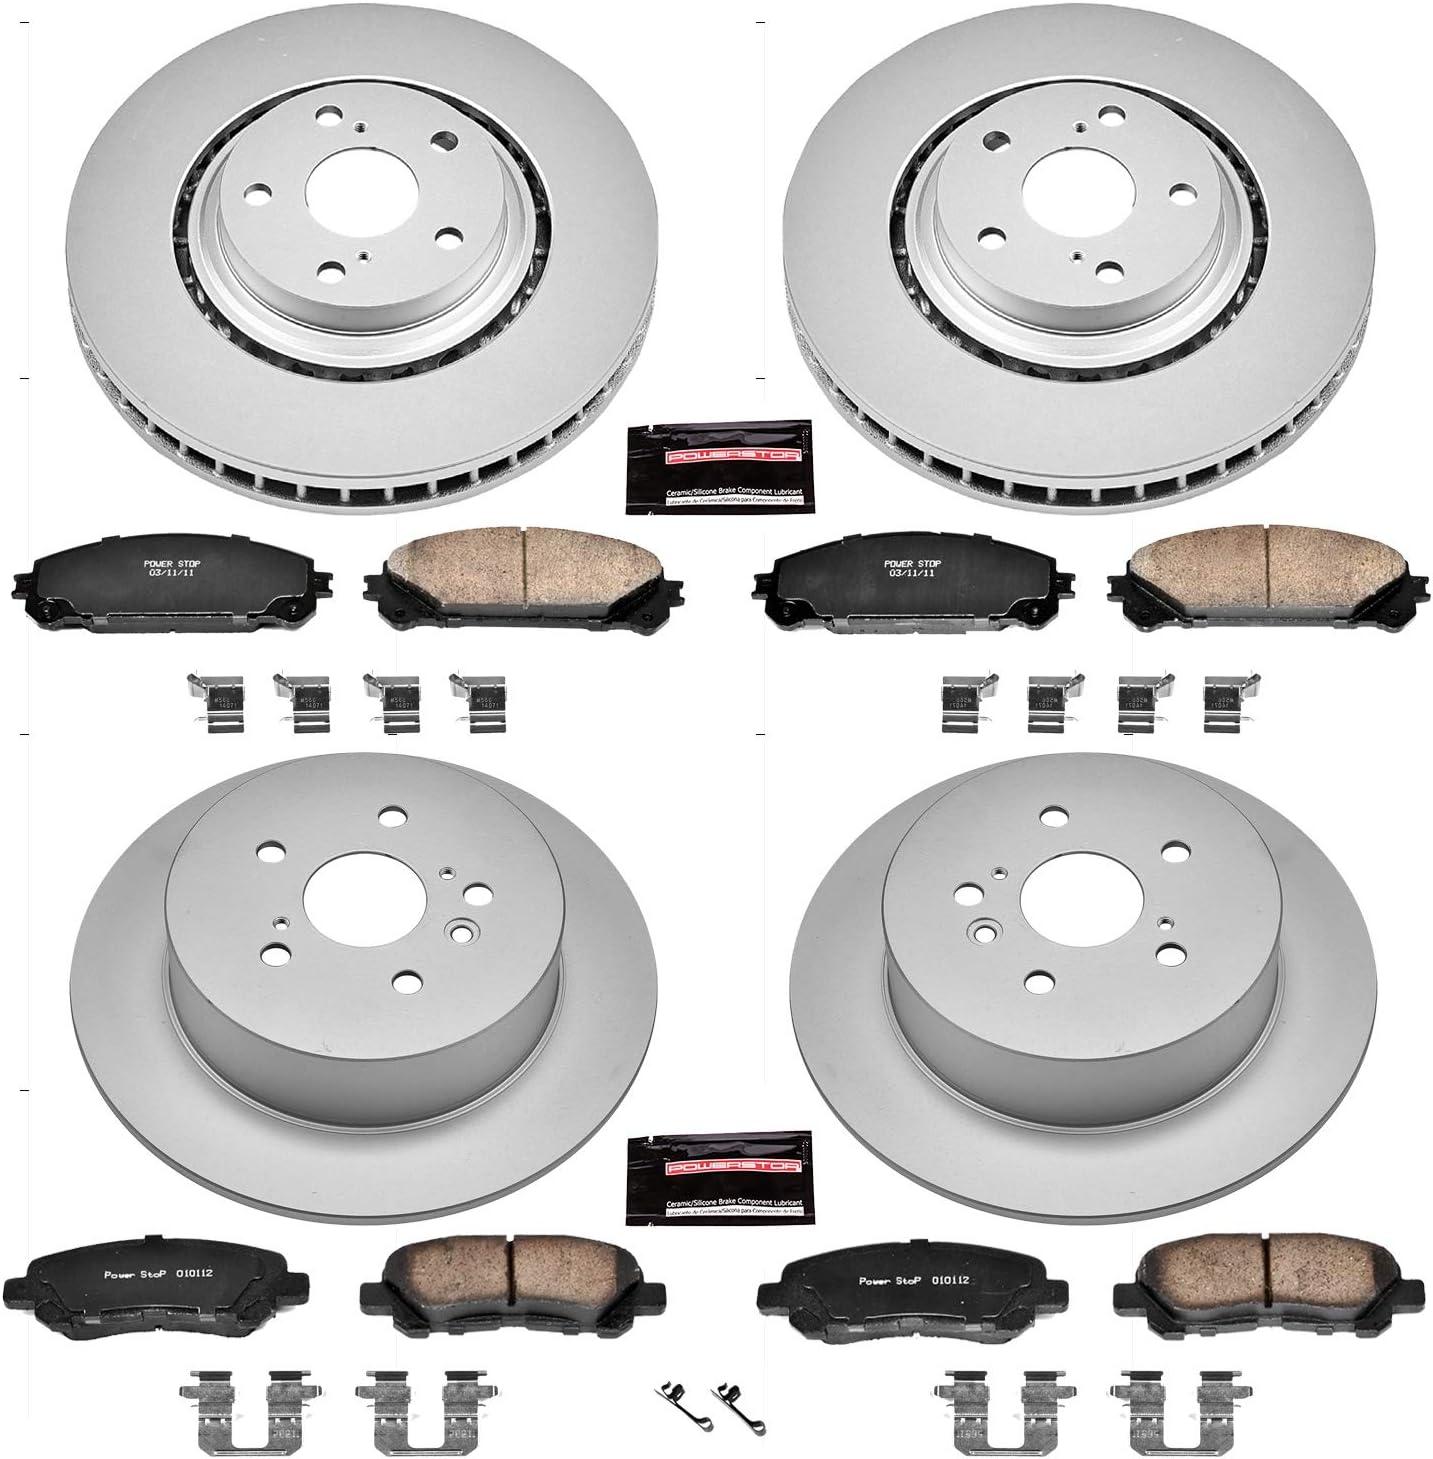 Power Stop KOE8420 Autospecailty Replacement Front Brake Kit-OE Brake Rotor /& Ceramic Brake Pads